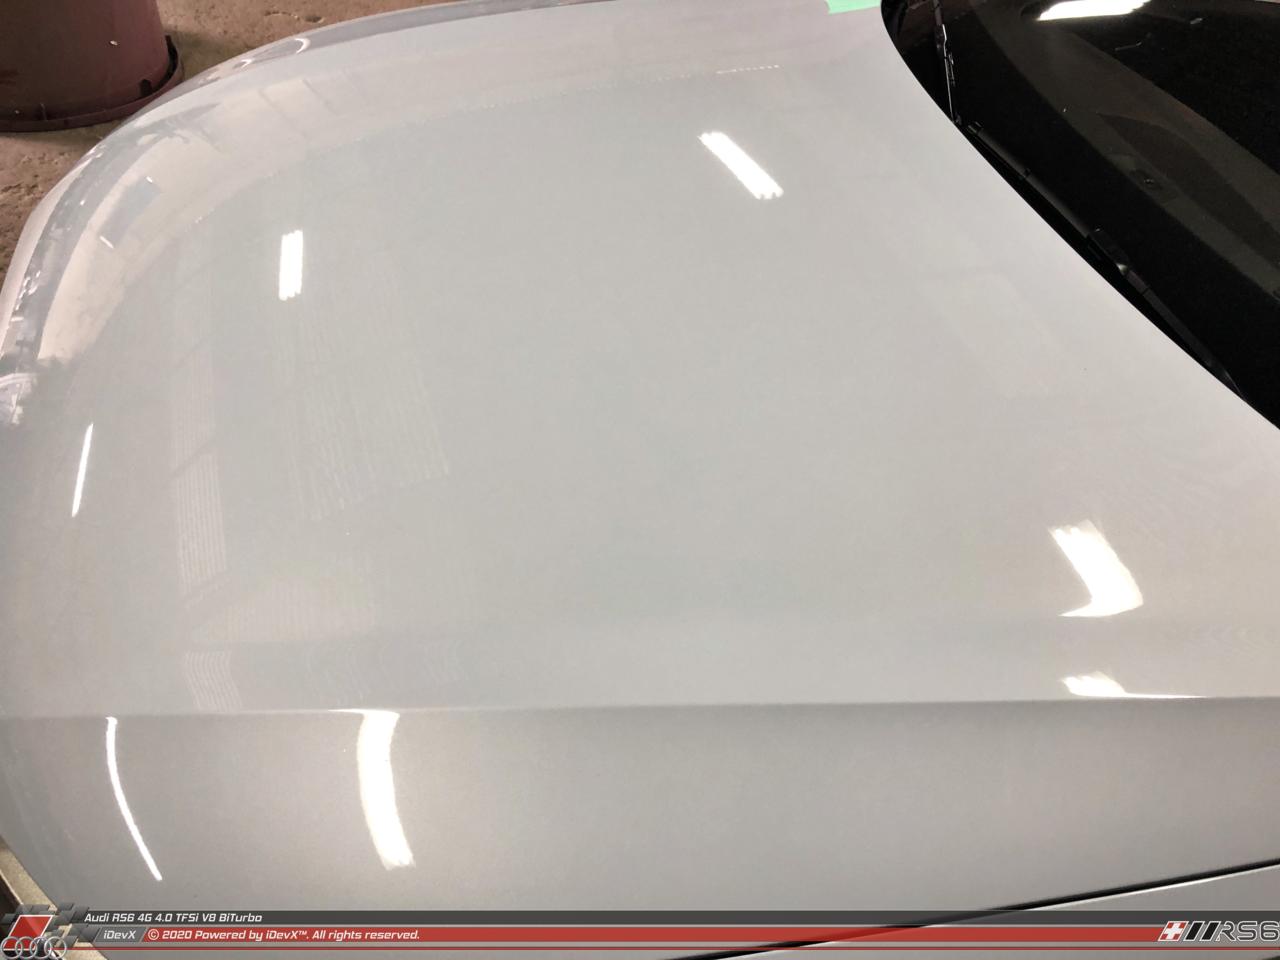 05_08.2019_Audi-RS6_iDevX_027.png